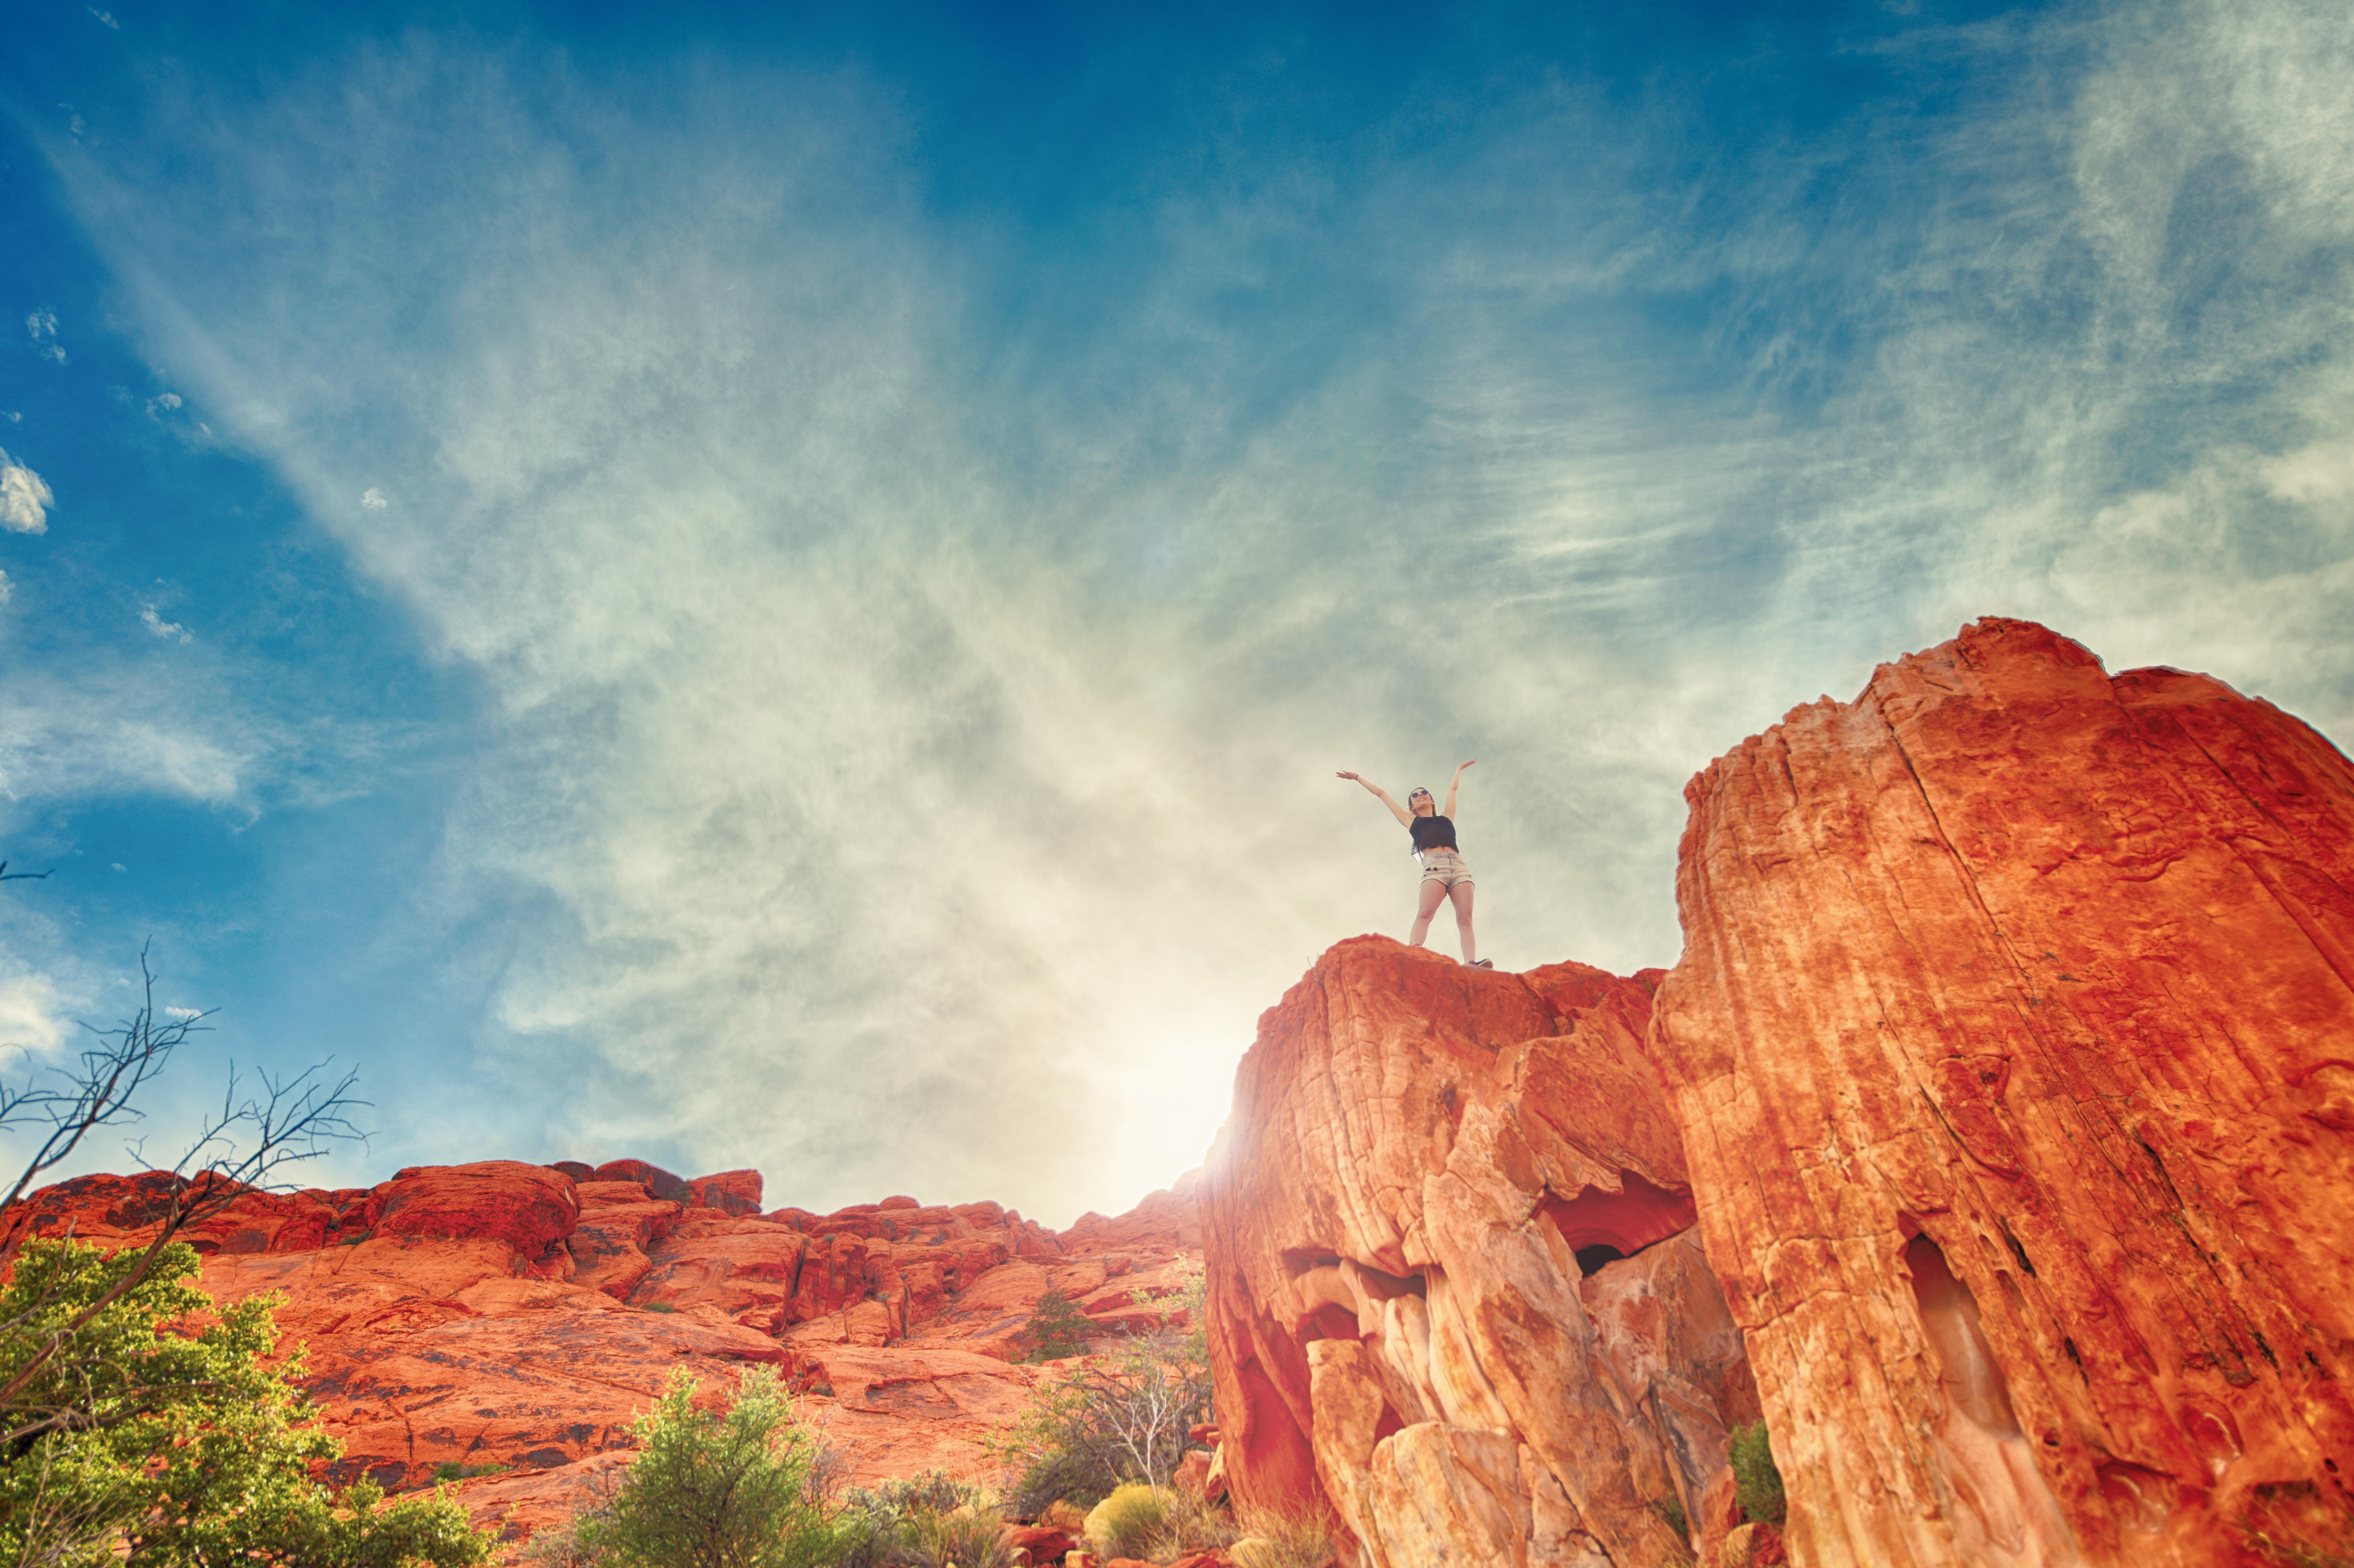 mountains-nature-sky-sunny.jpg